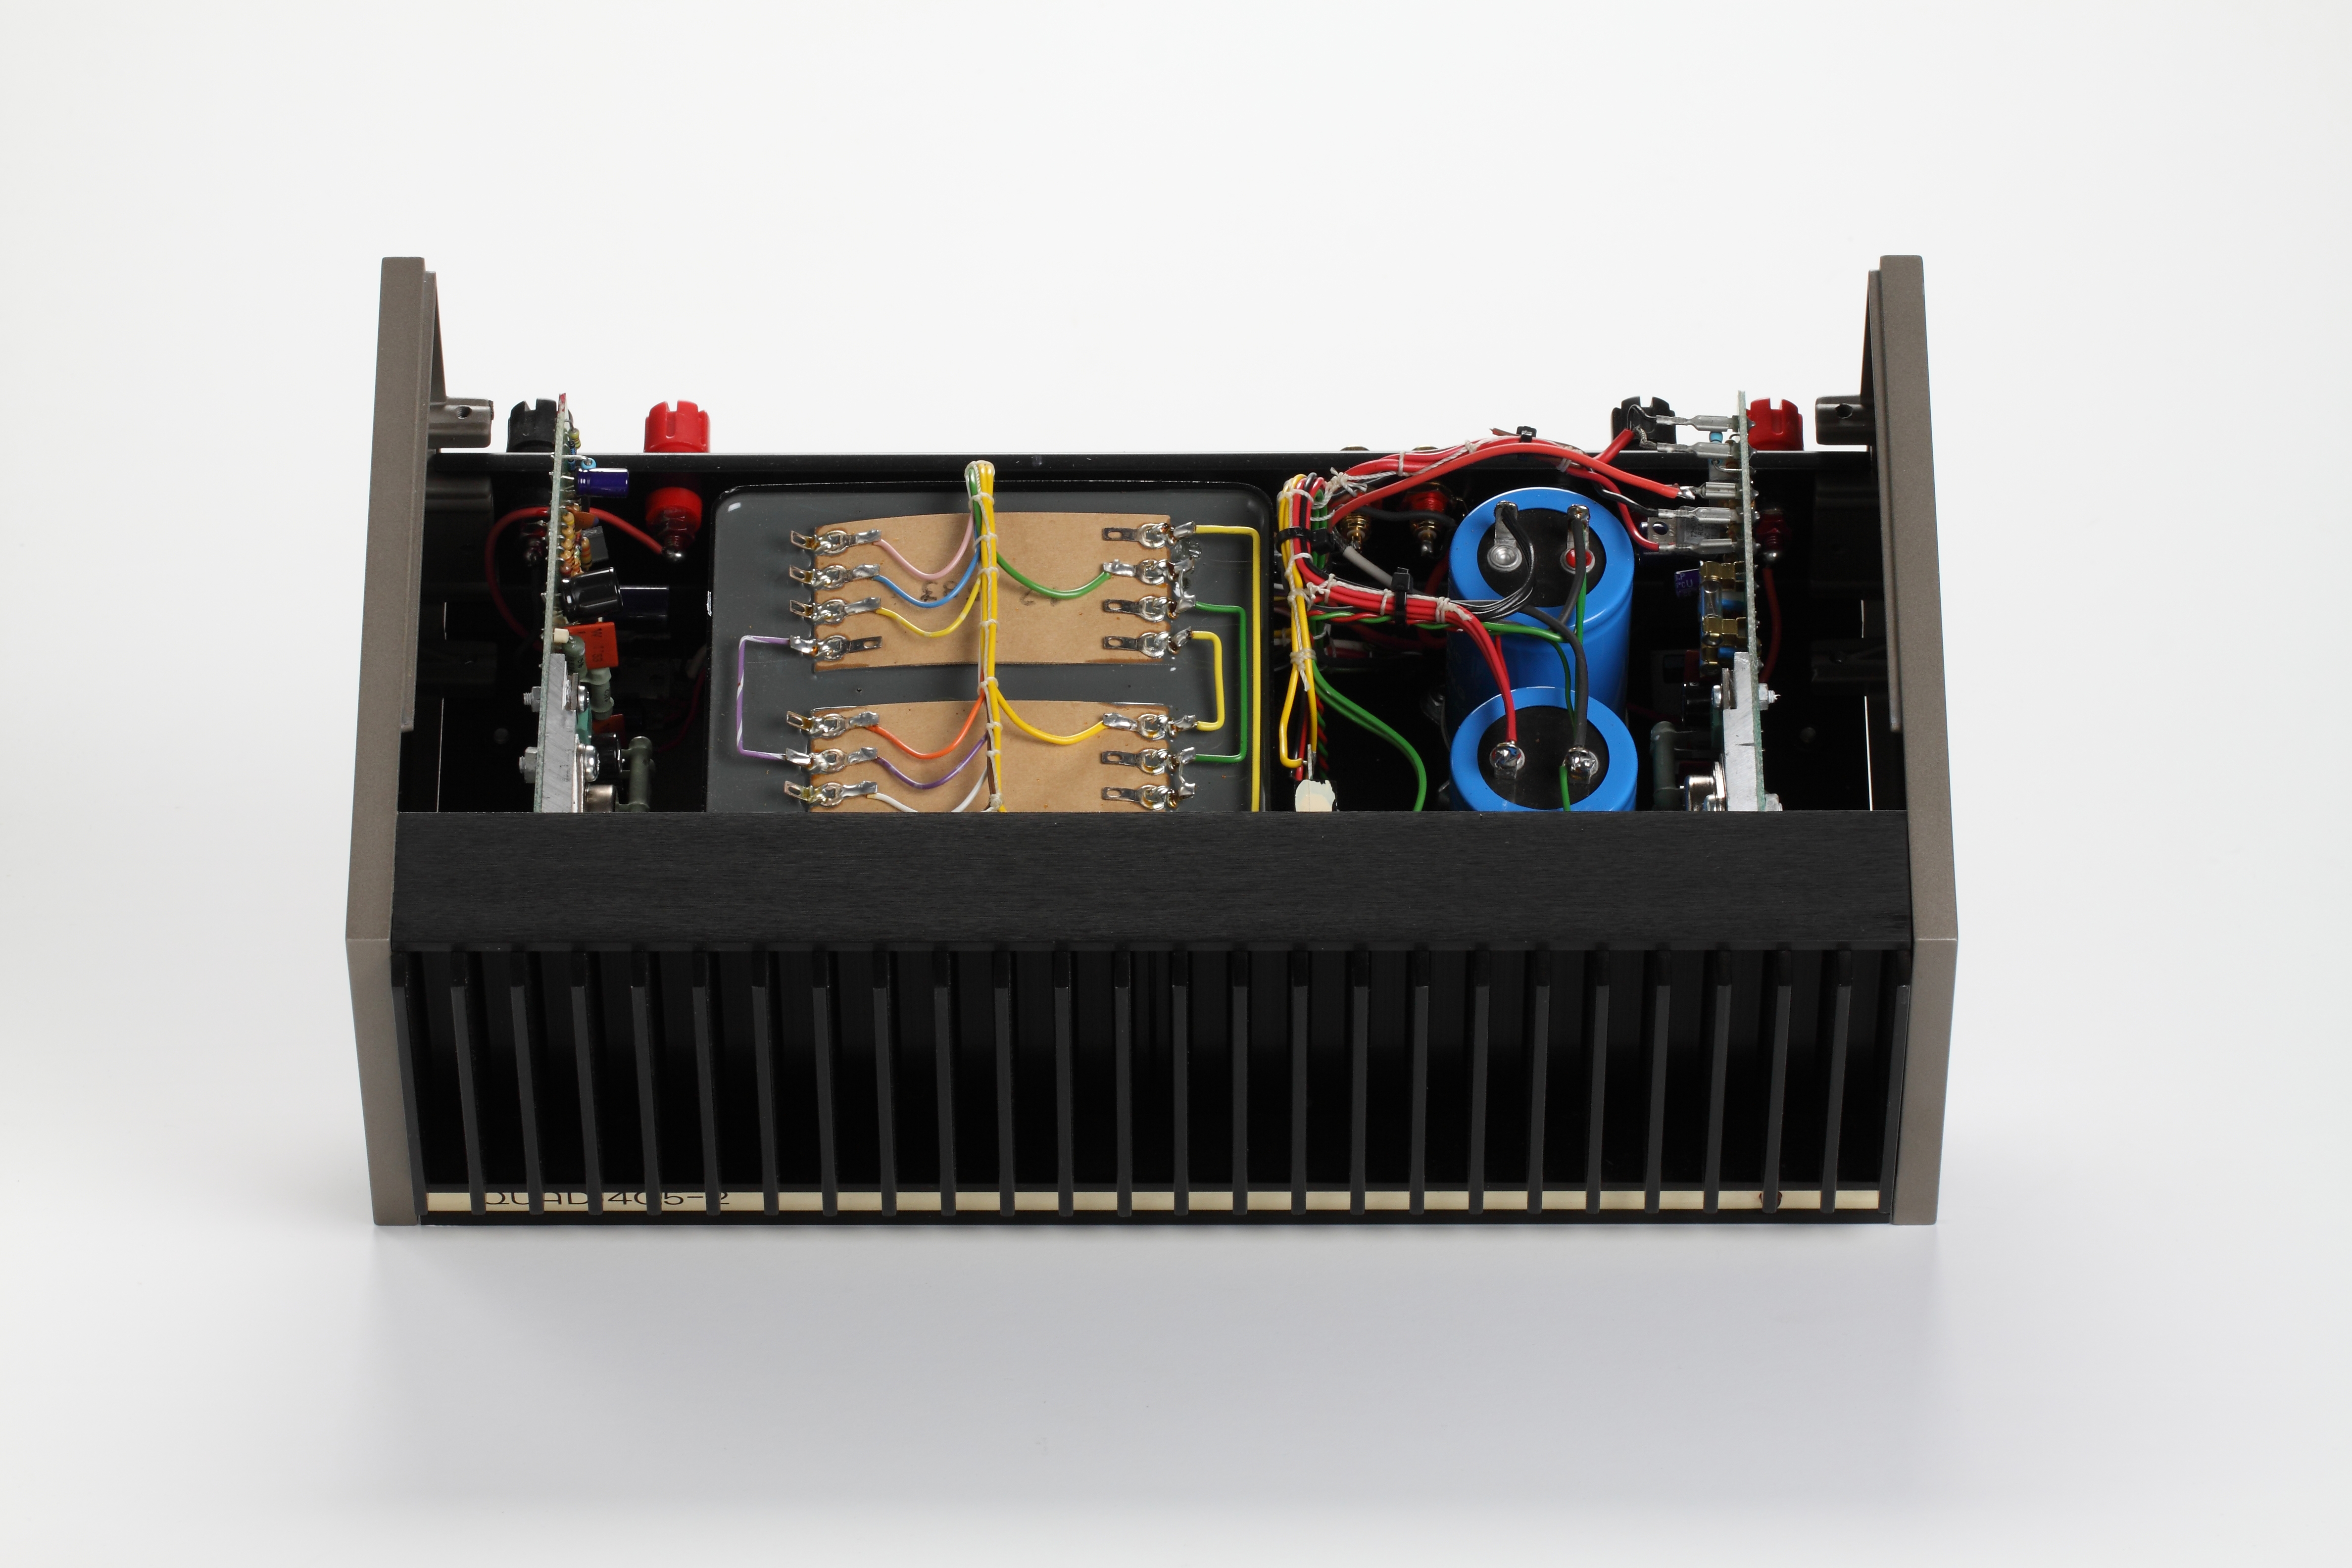 File:Quad-405 Endverstärker jpg - Wikimedia Commons